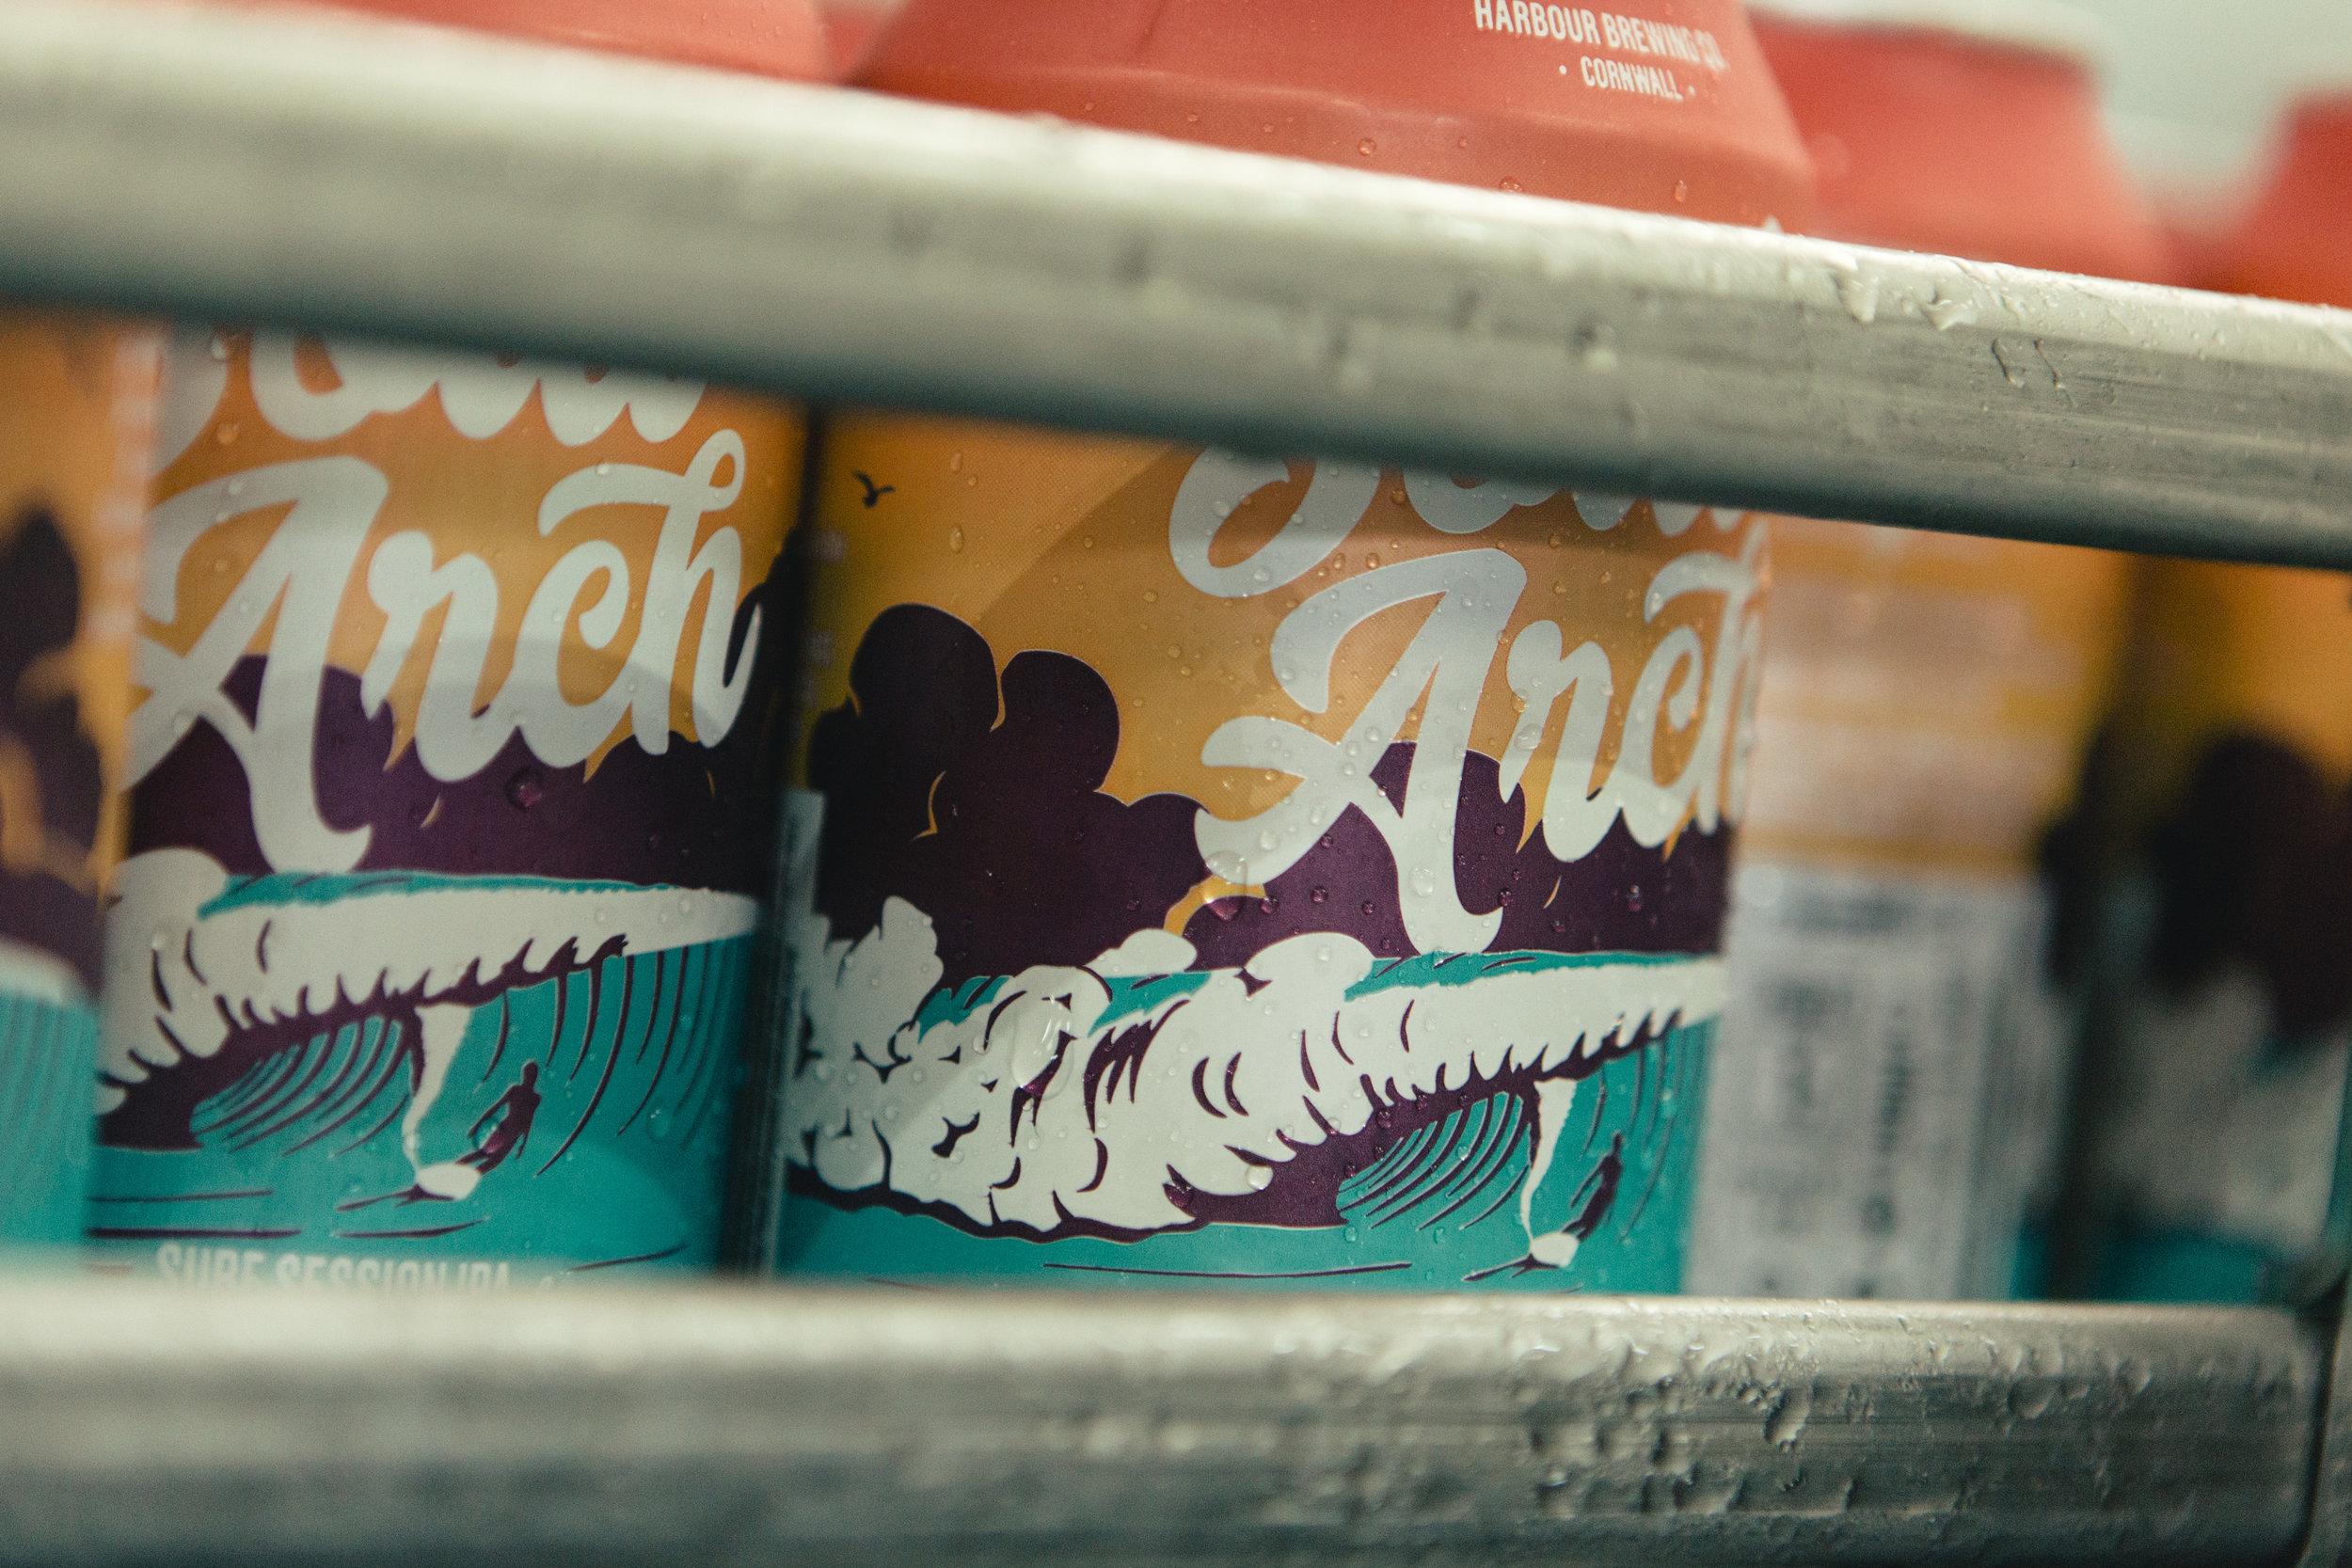 soul-arch-beer-harbour-brewery-aside-studio-design20.jpg